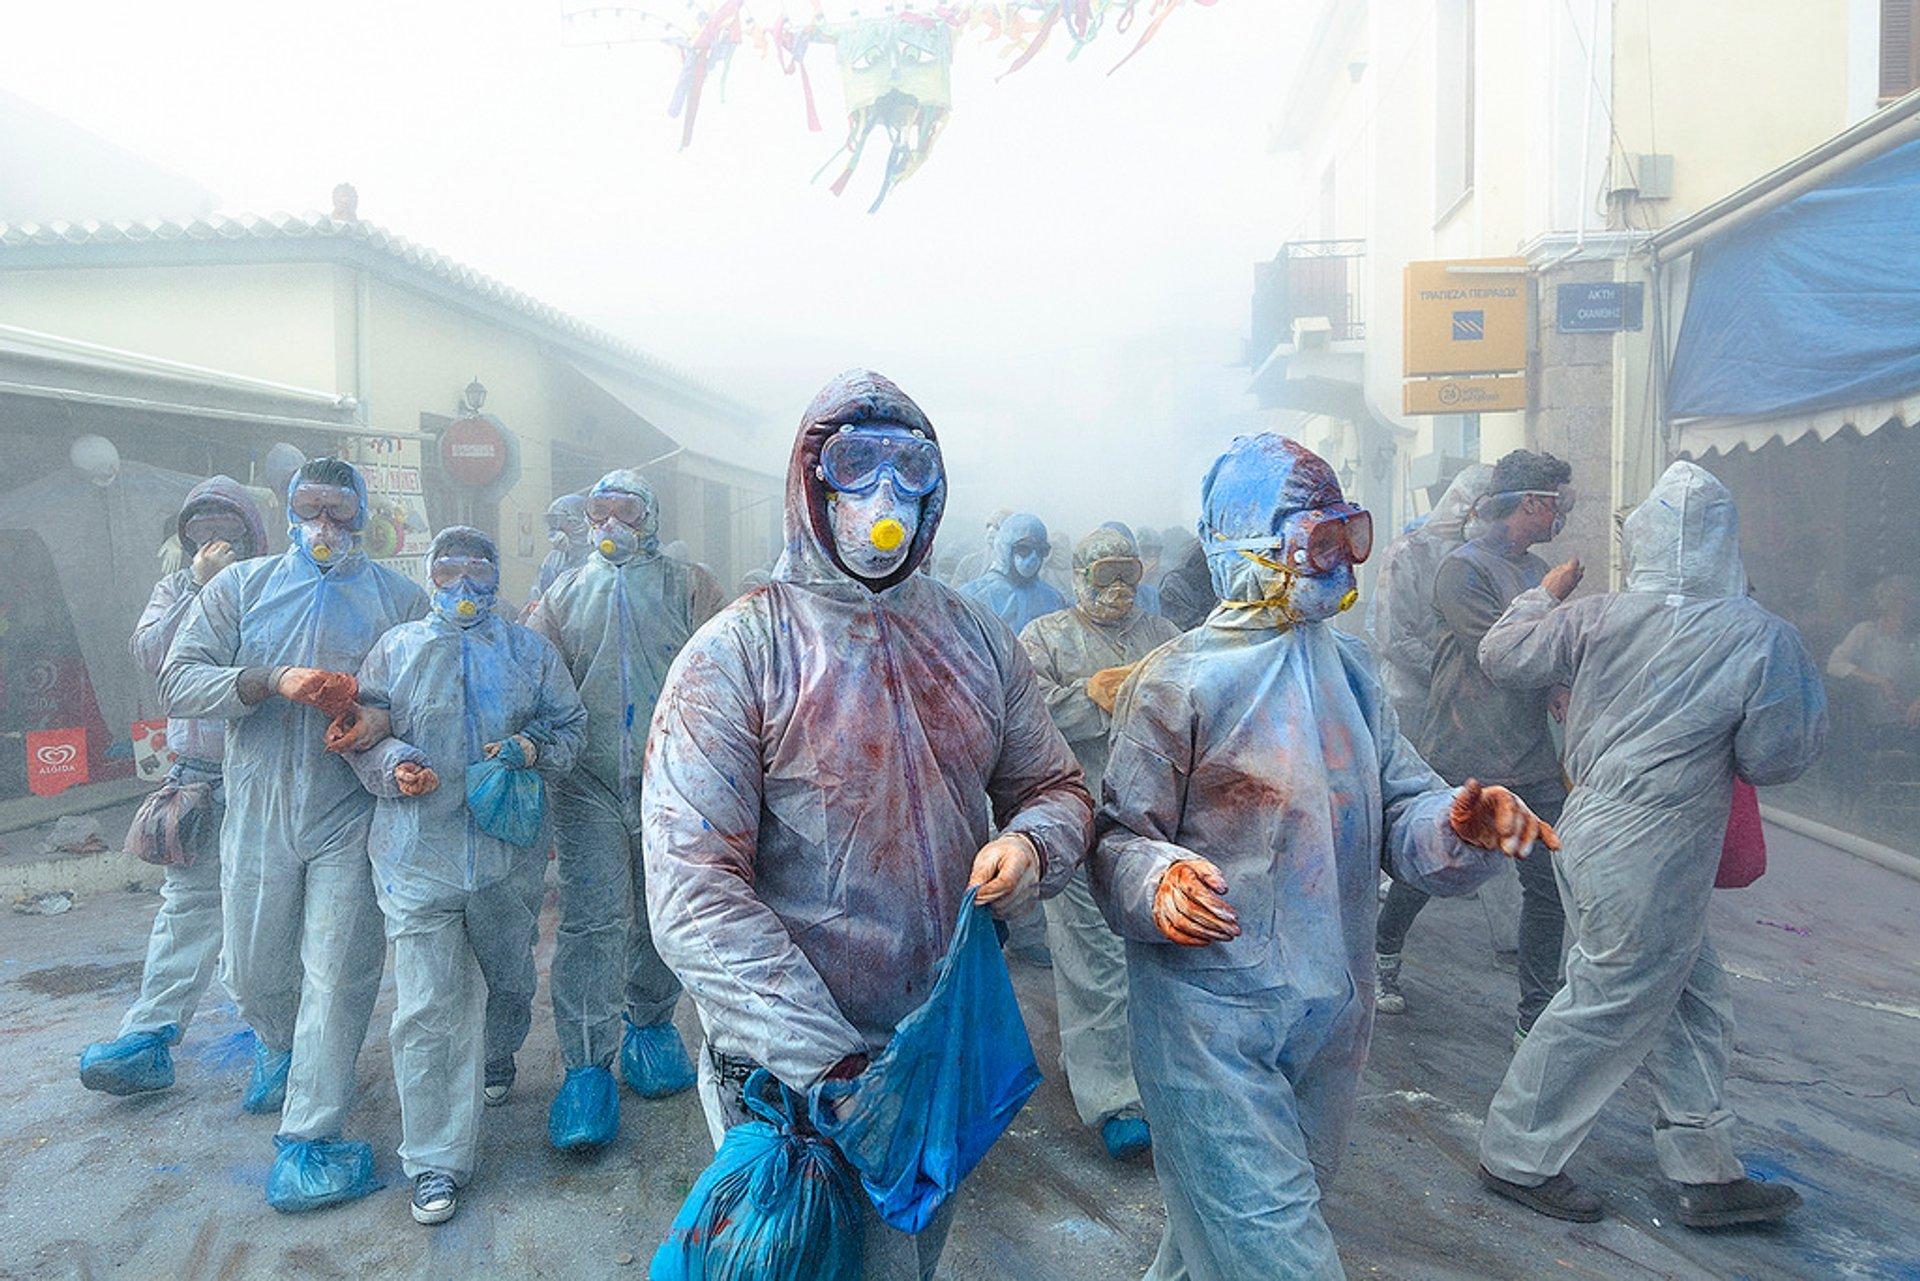 Galaxidi Flour War Carnival in Greece - Best Time